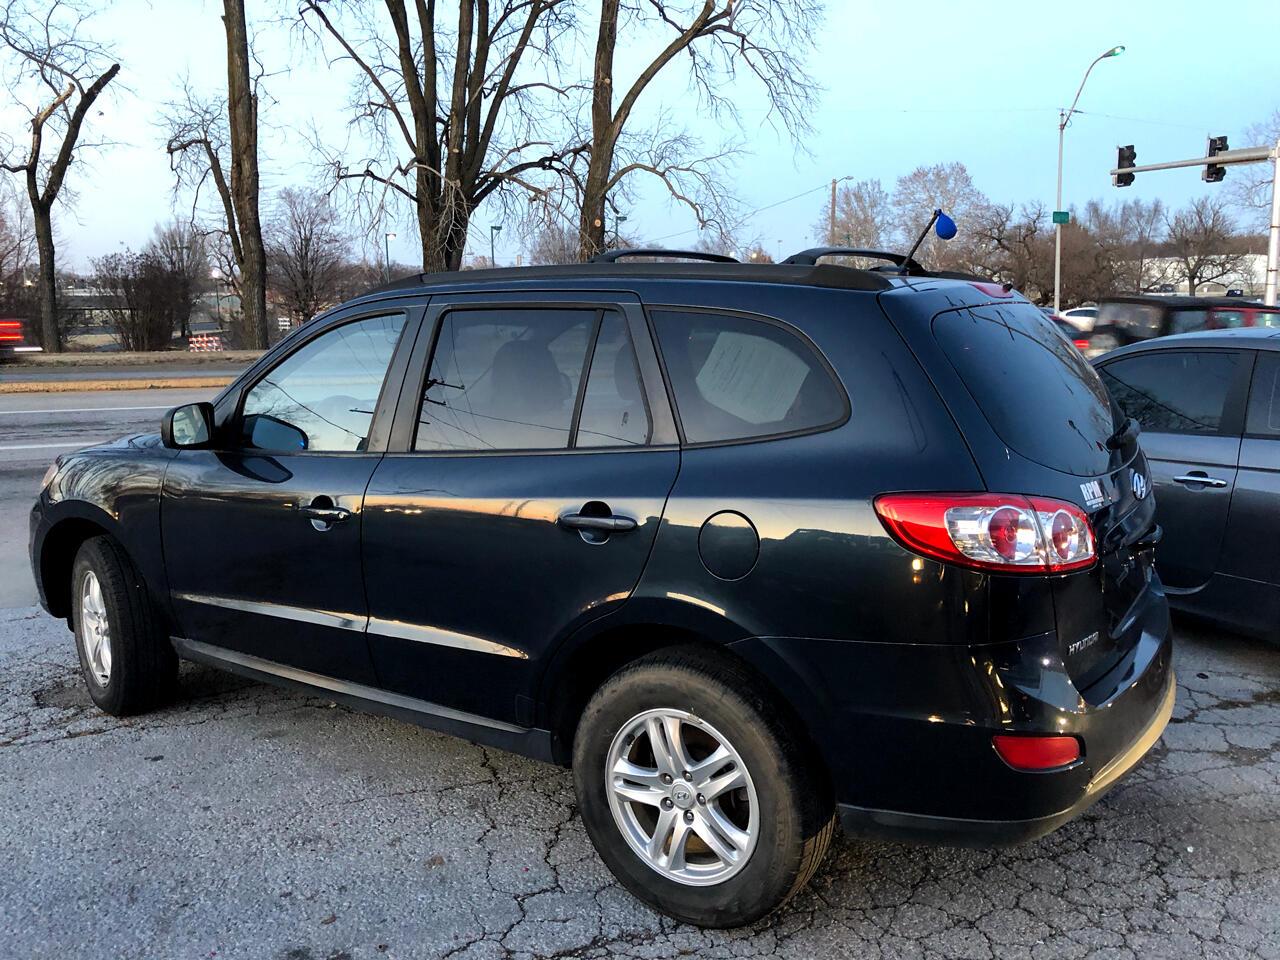 Hyundai Santa Fe 4dr 2WD Auto 2.4L I4 2010